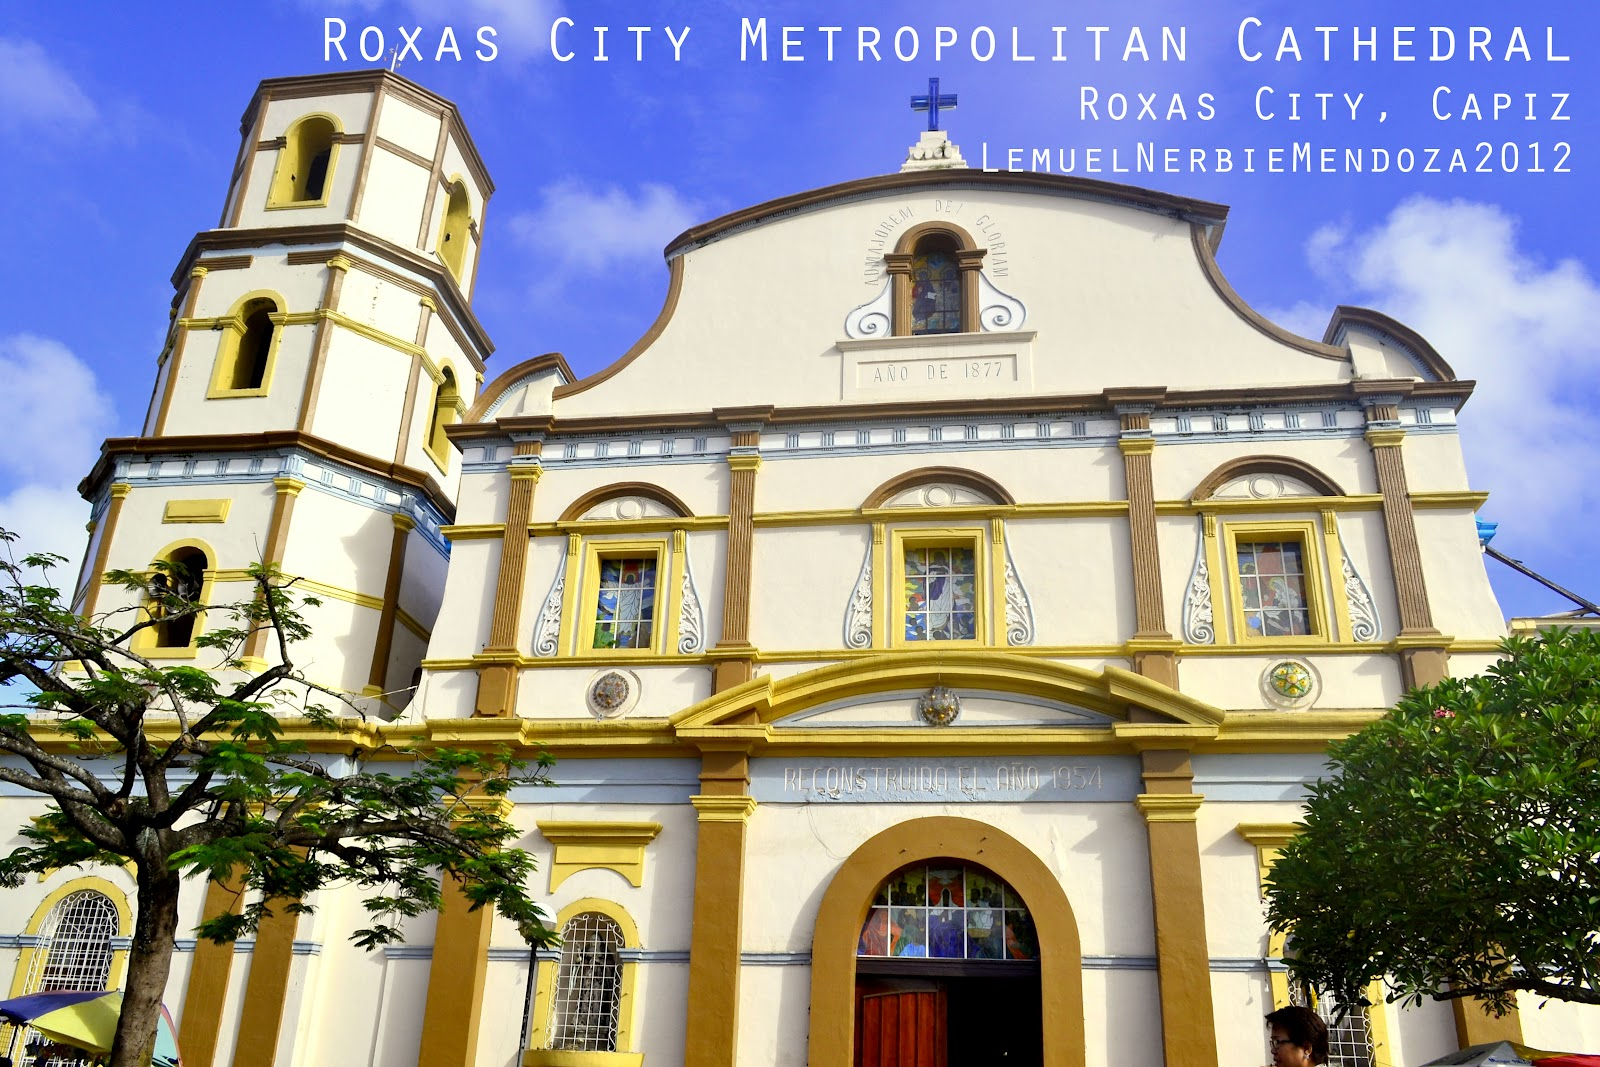 Roxas City (Capiz) Philippines  city photos : ... de las Filipinas: ROXAS CITY, Capiz: Roxas Metropolitan Cathedral